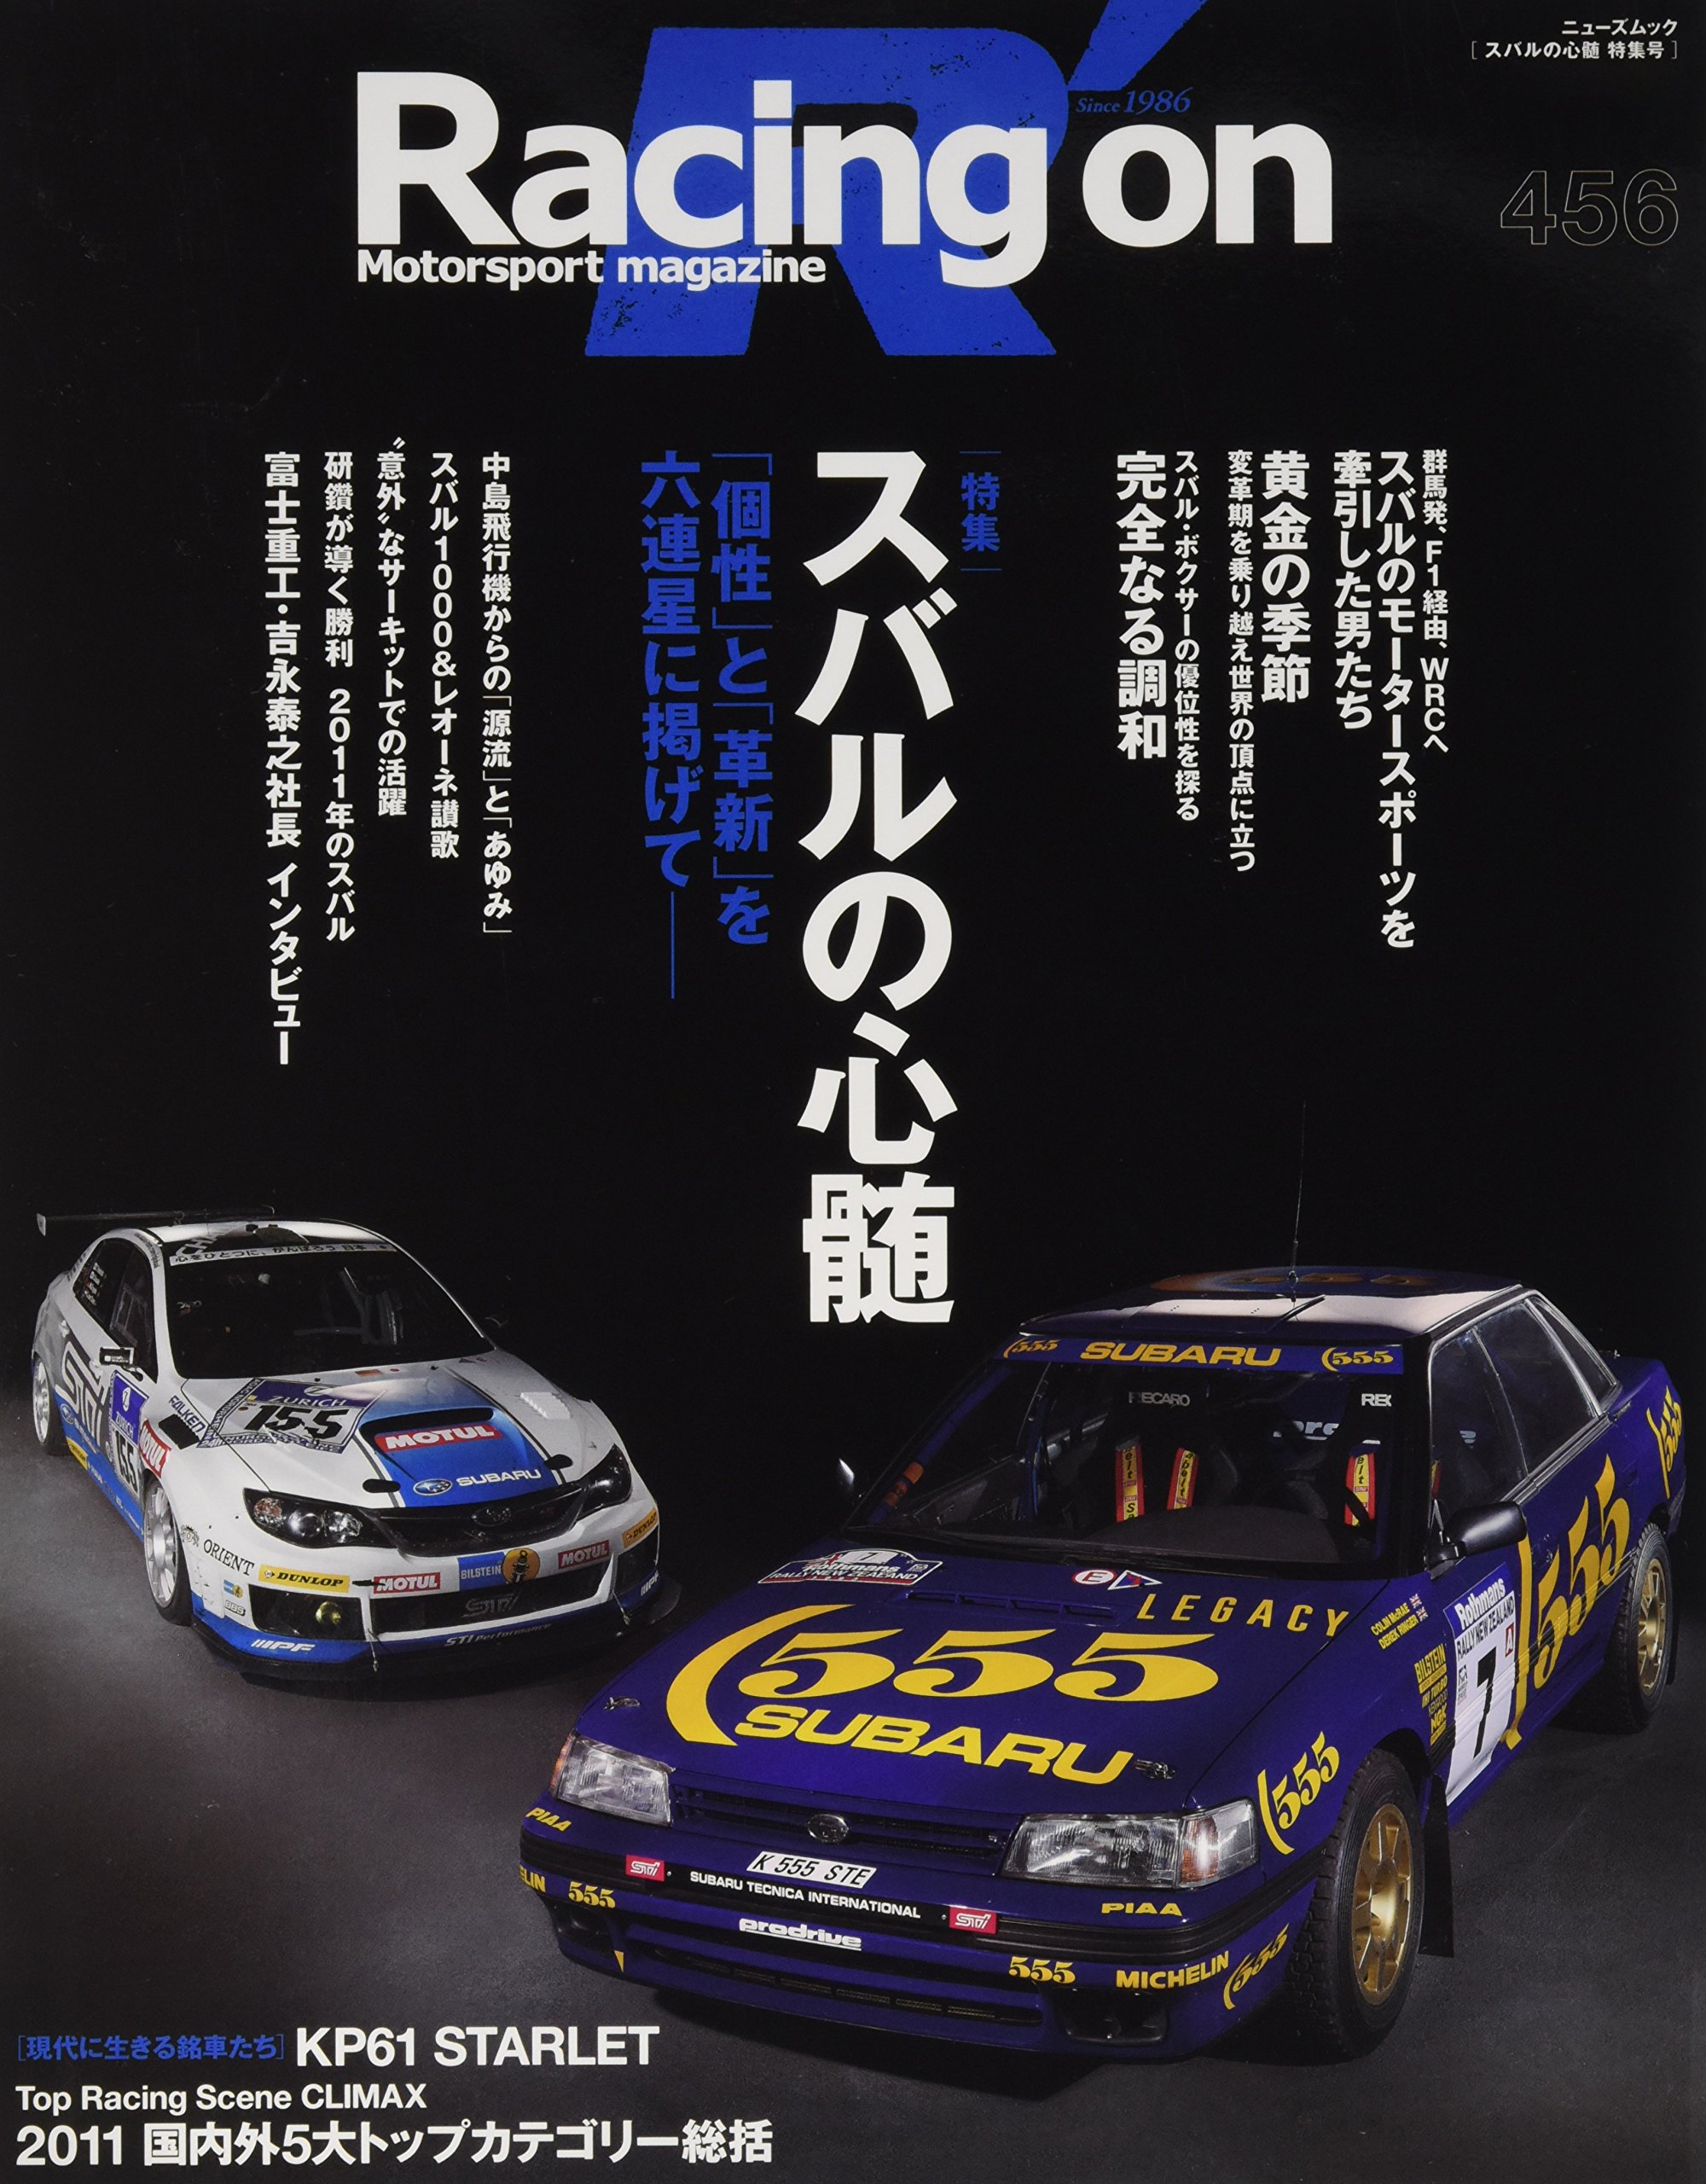 456 Racing on Subaru heart mind - Motsorsport magazine (NEWS mook) Mook - 2011/12/1 ebook